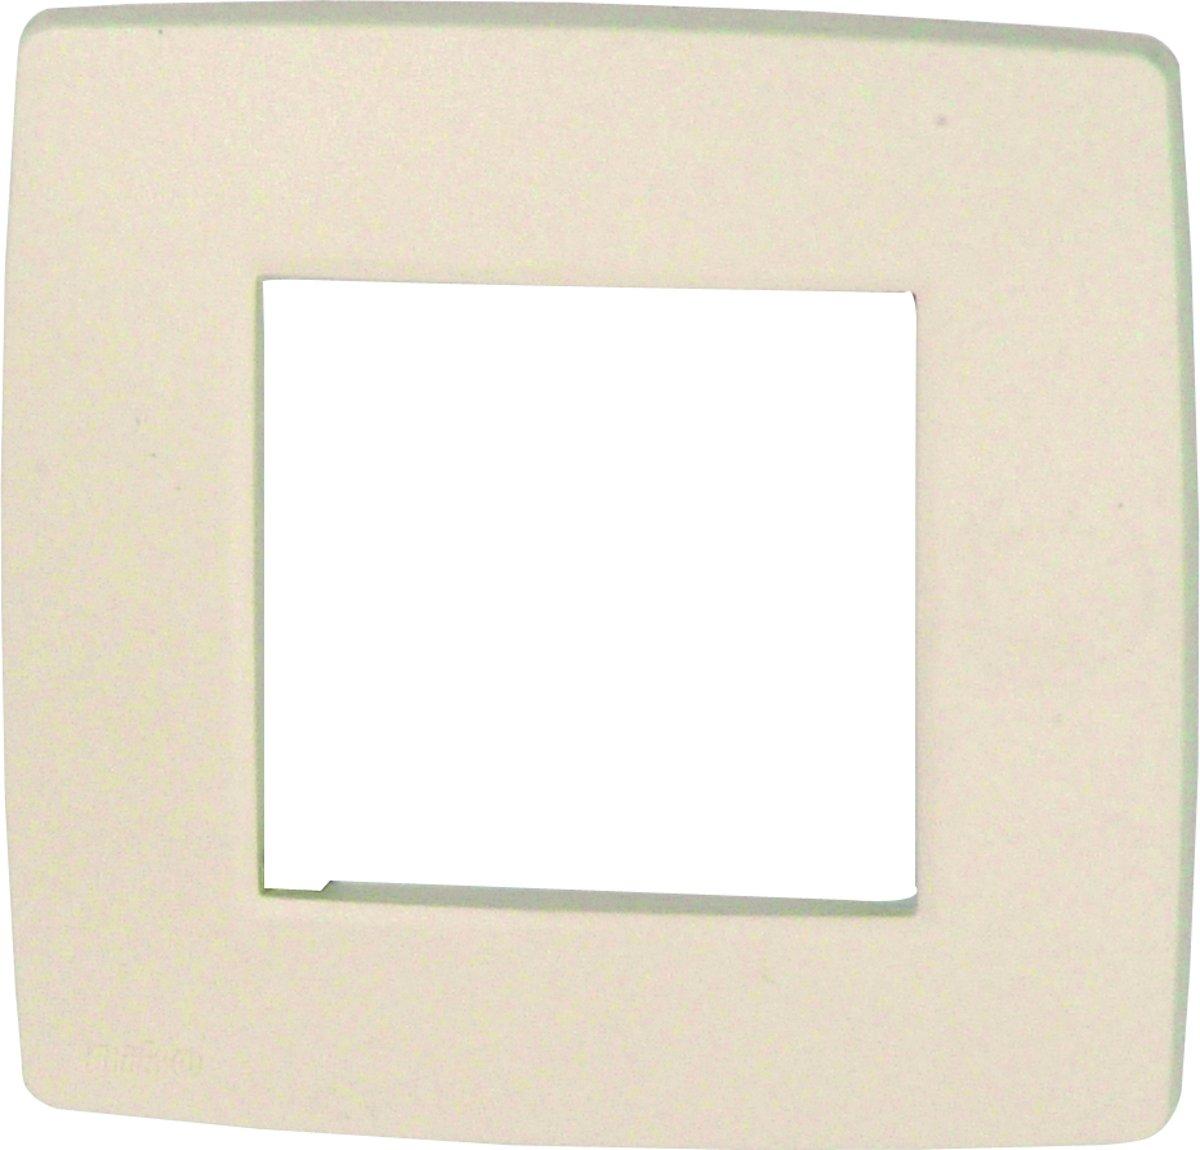 NIKO Original Cream afdekplaat - enkelvoudig - 10 stuks